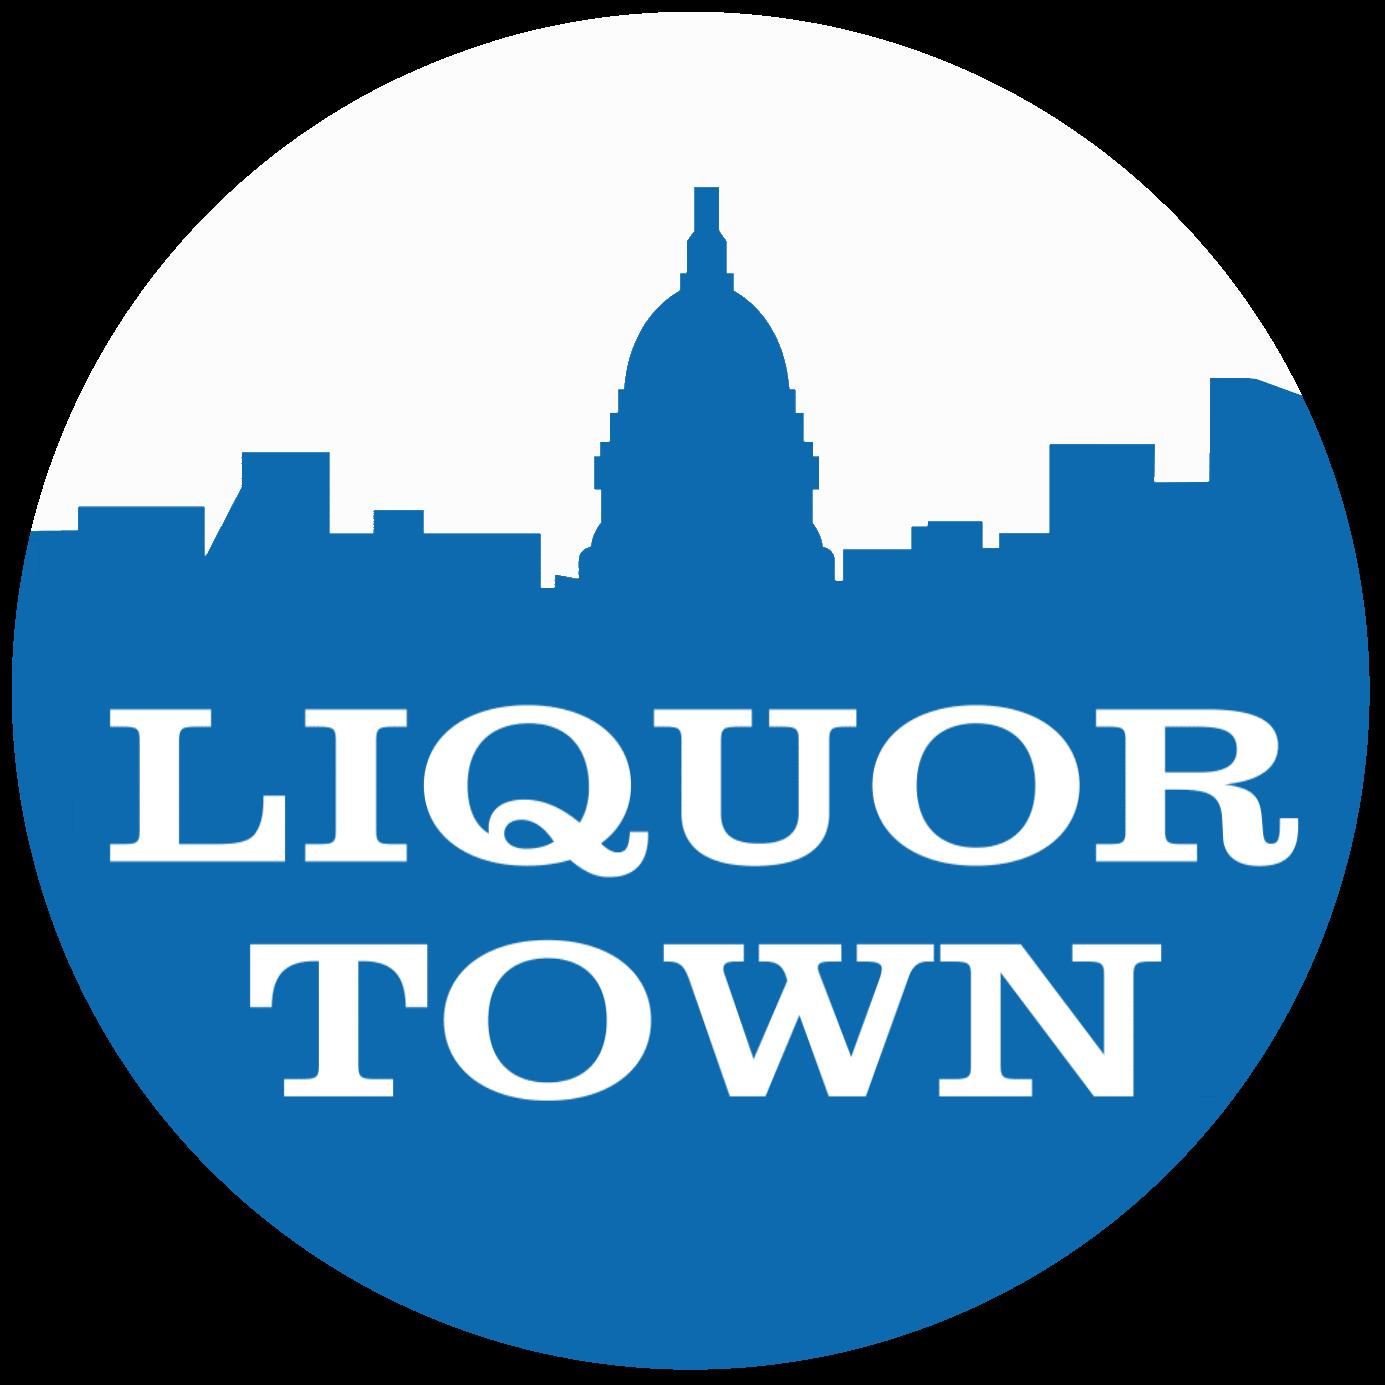 liquor town logo circle